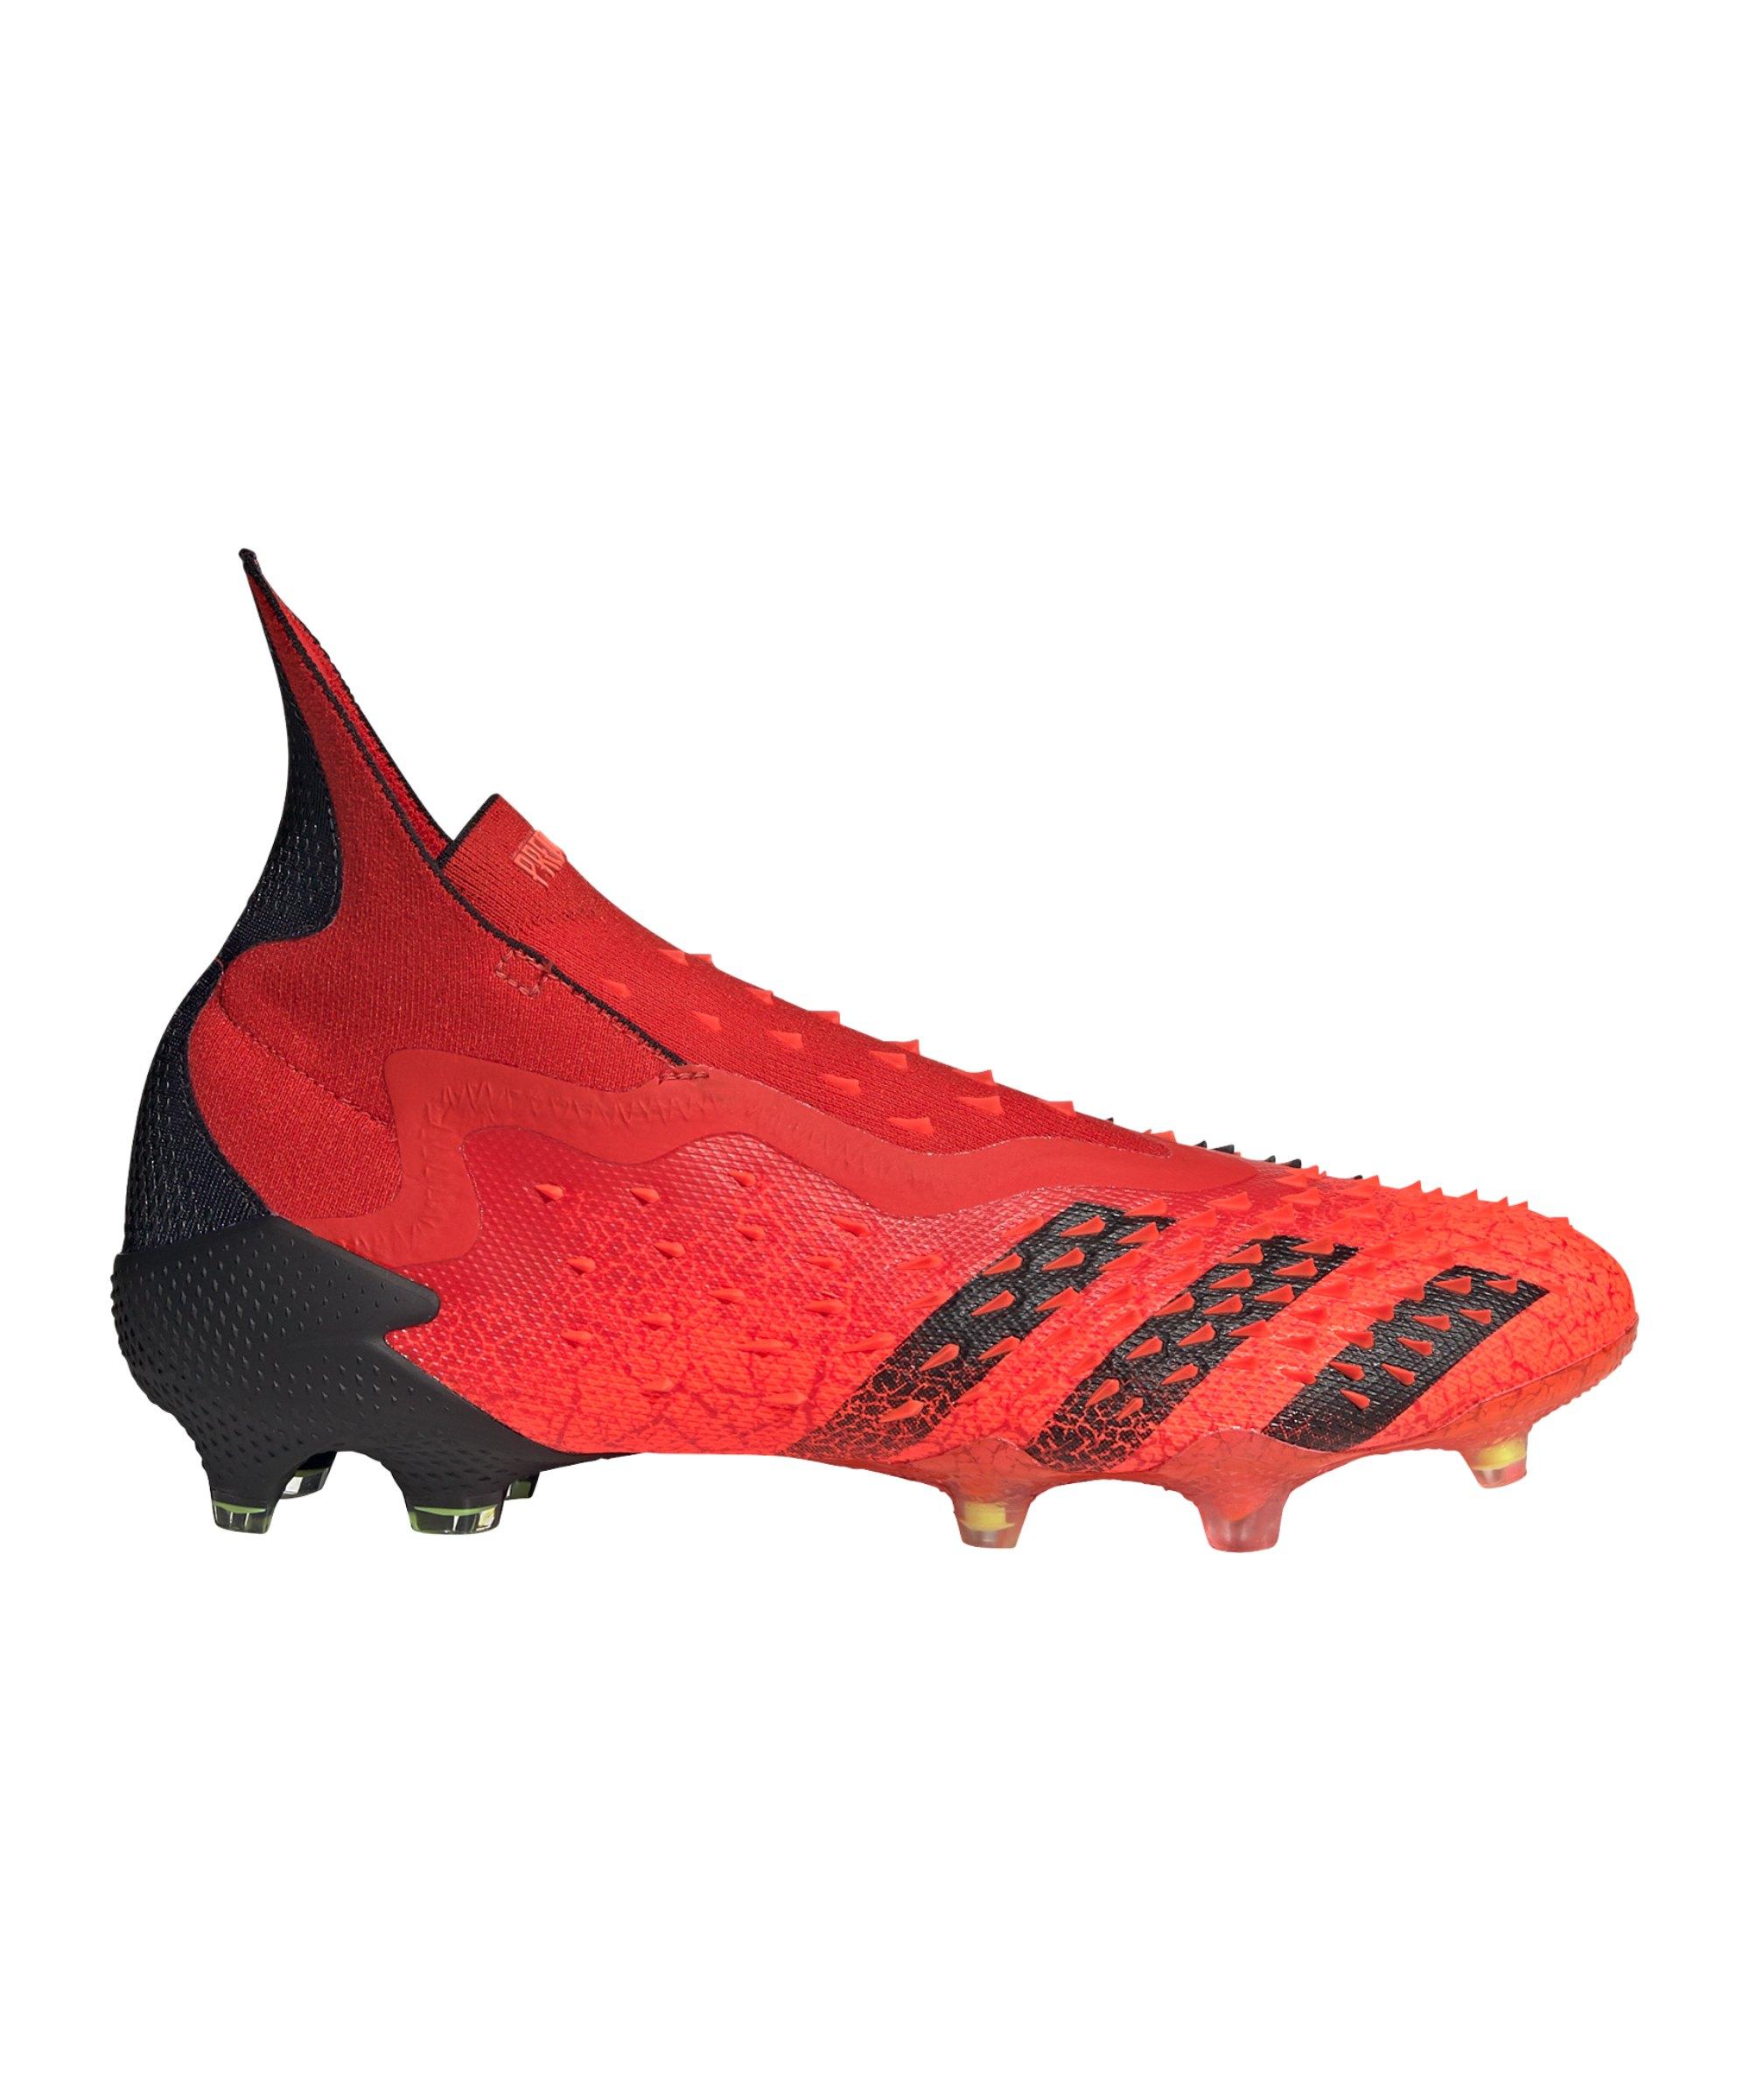 adidas Predator FREAK+ FG Meteorite Rot Schwarz - rot